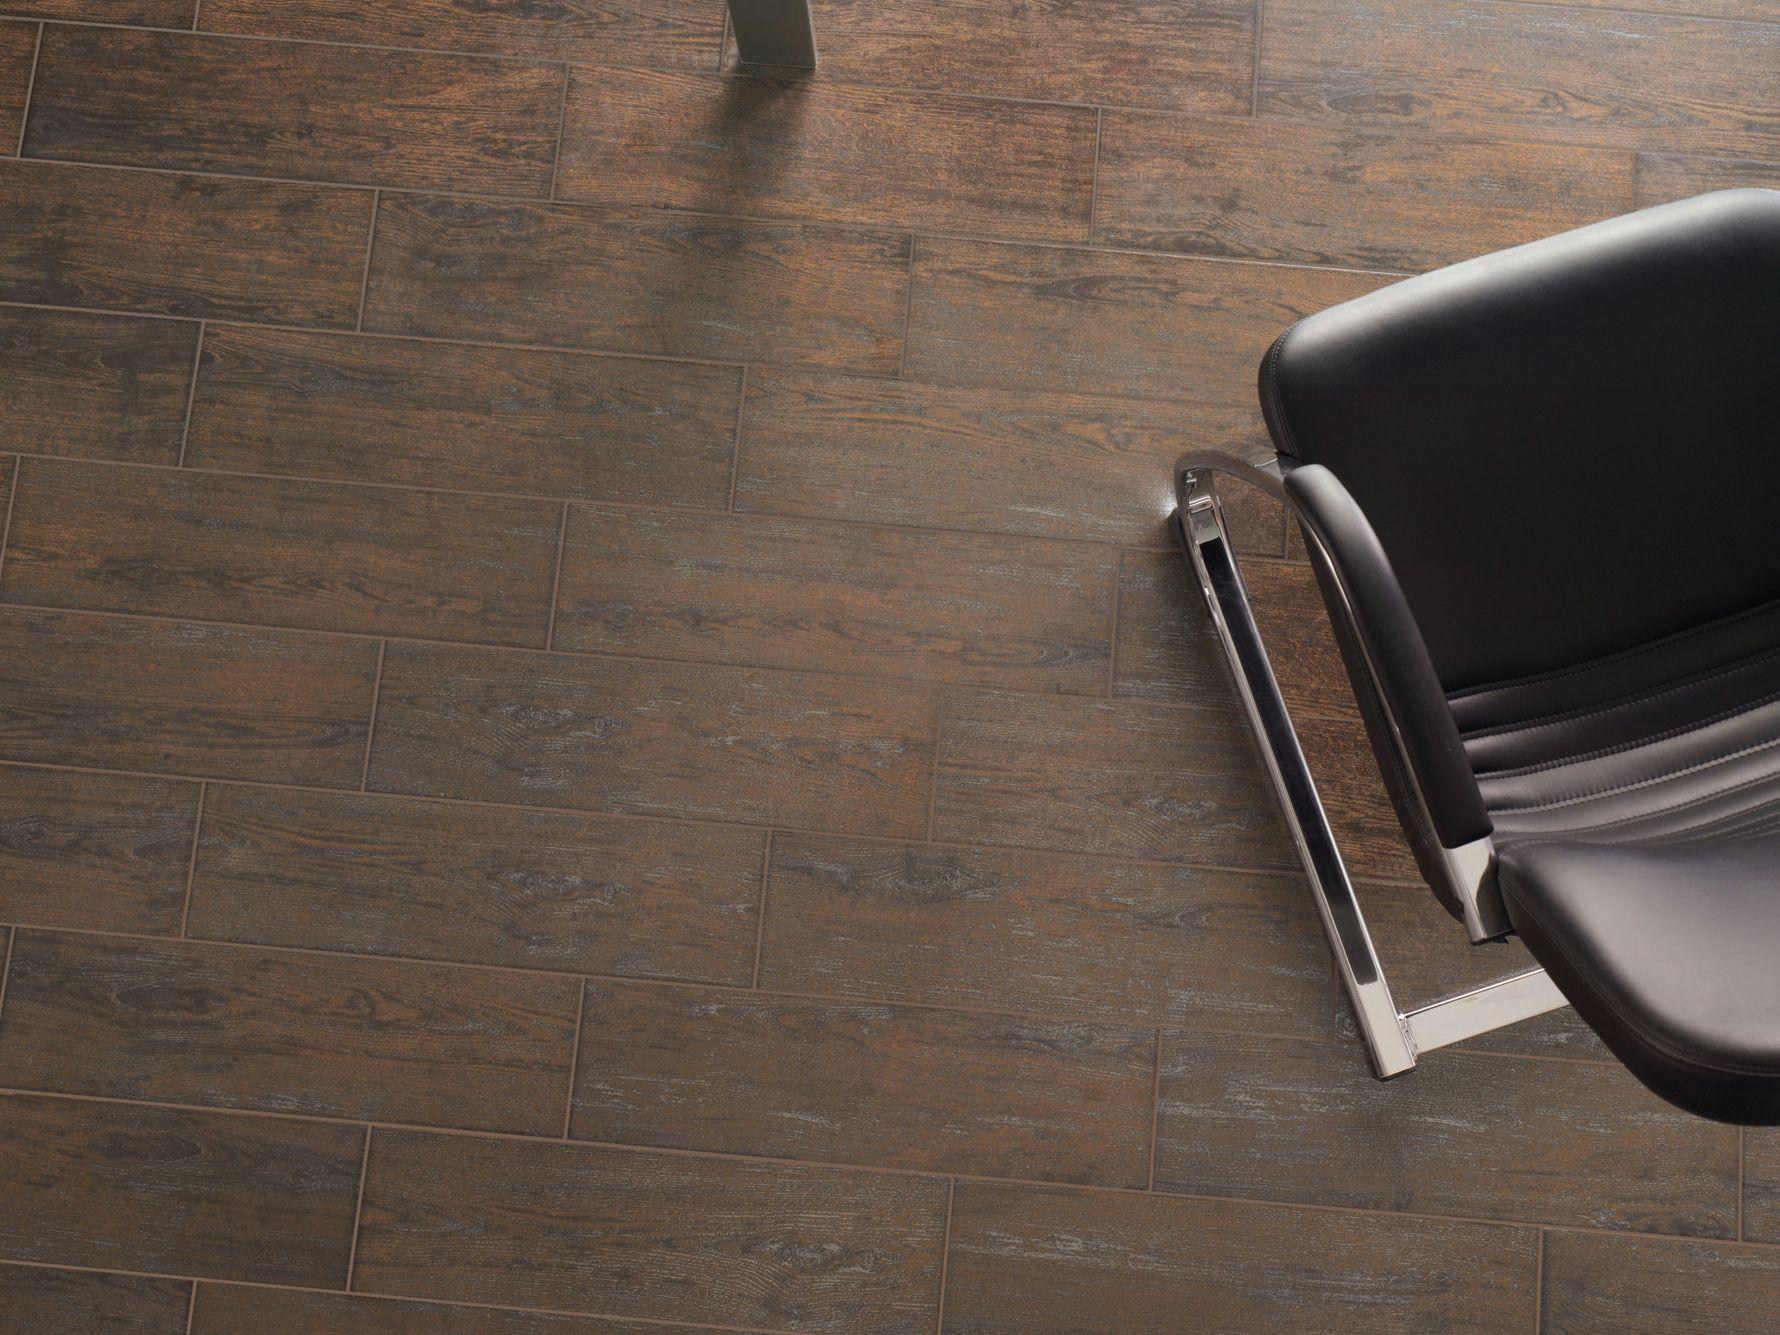 Pavimento de gres porcel nico imitaci n madera metal wood for Pavimento imitacion madera